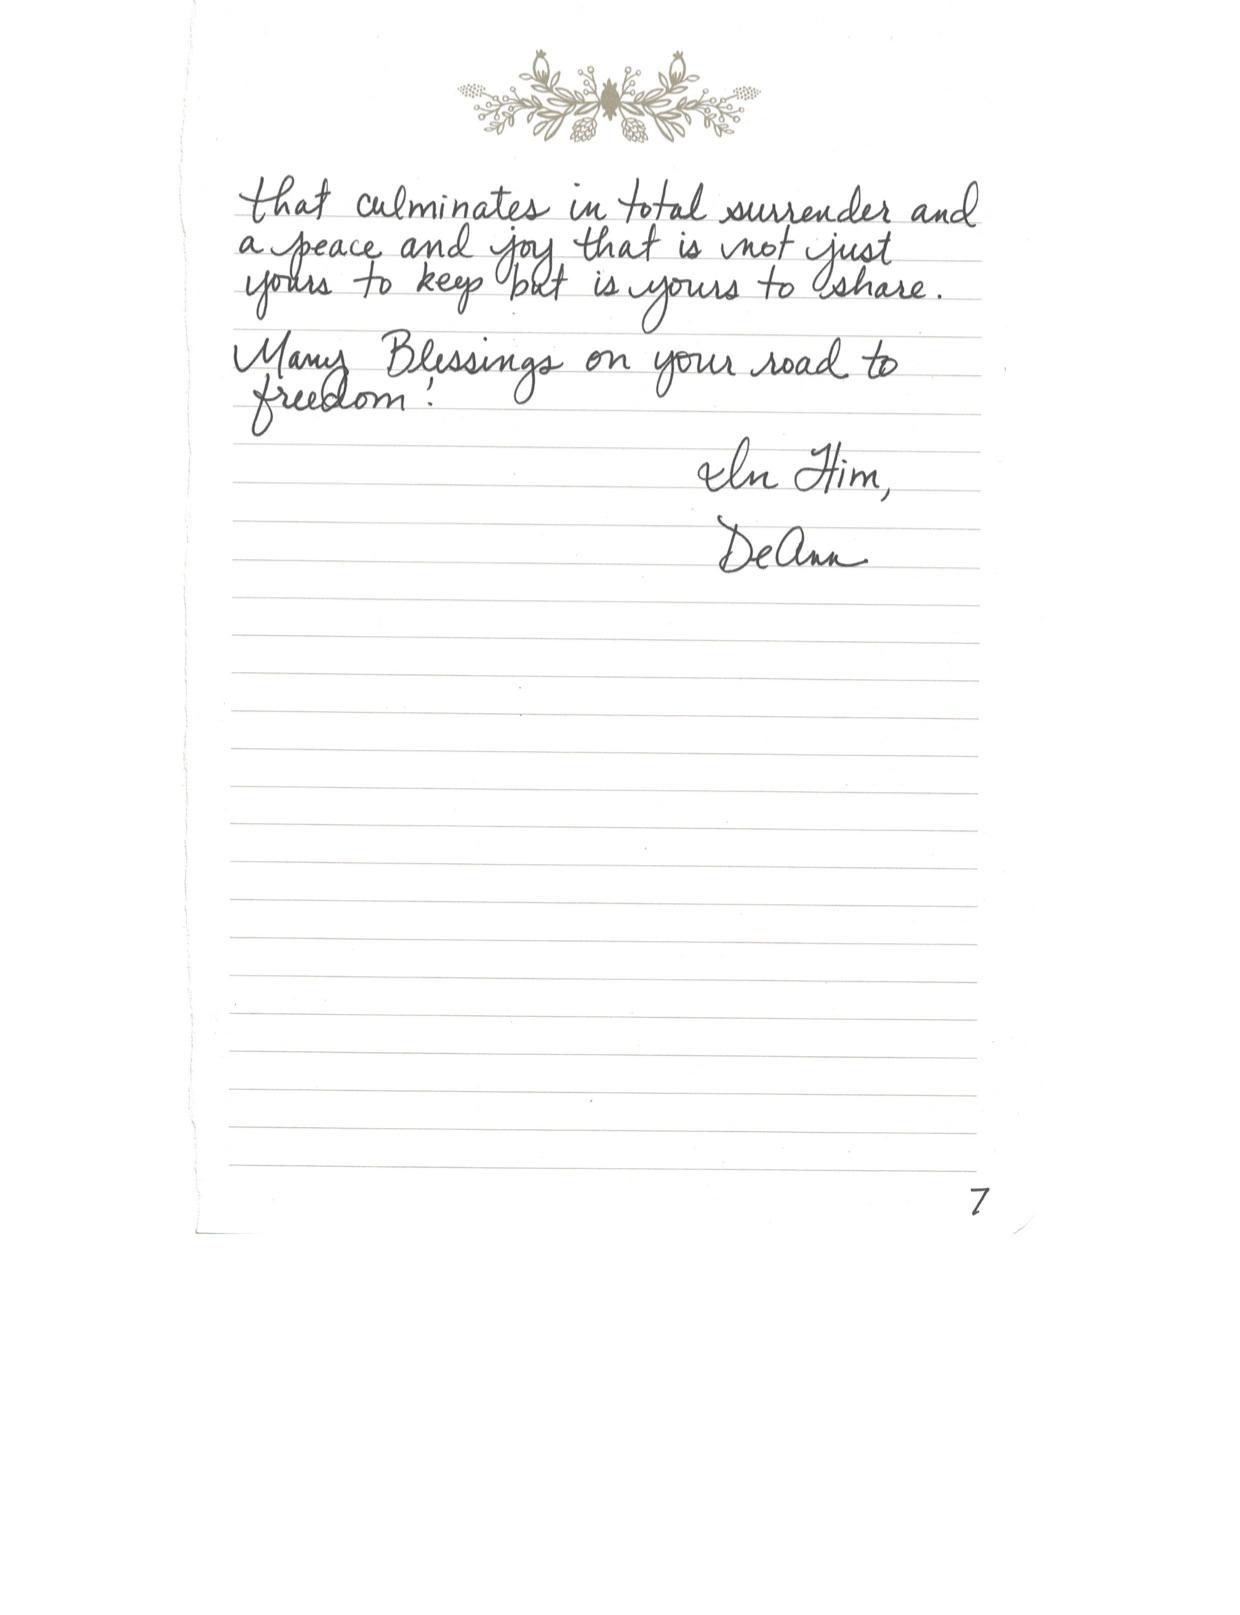 DeAnn_Malcolm_Handwritten7.jpg